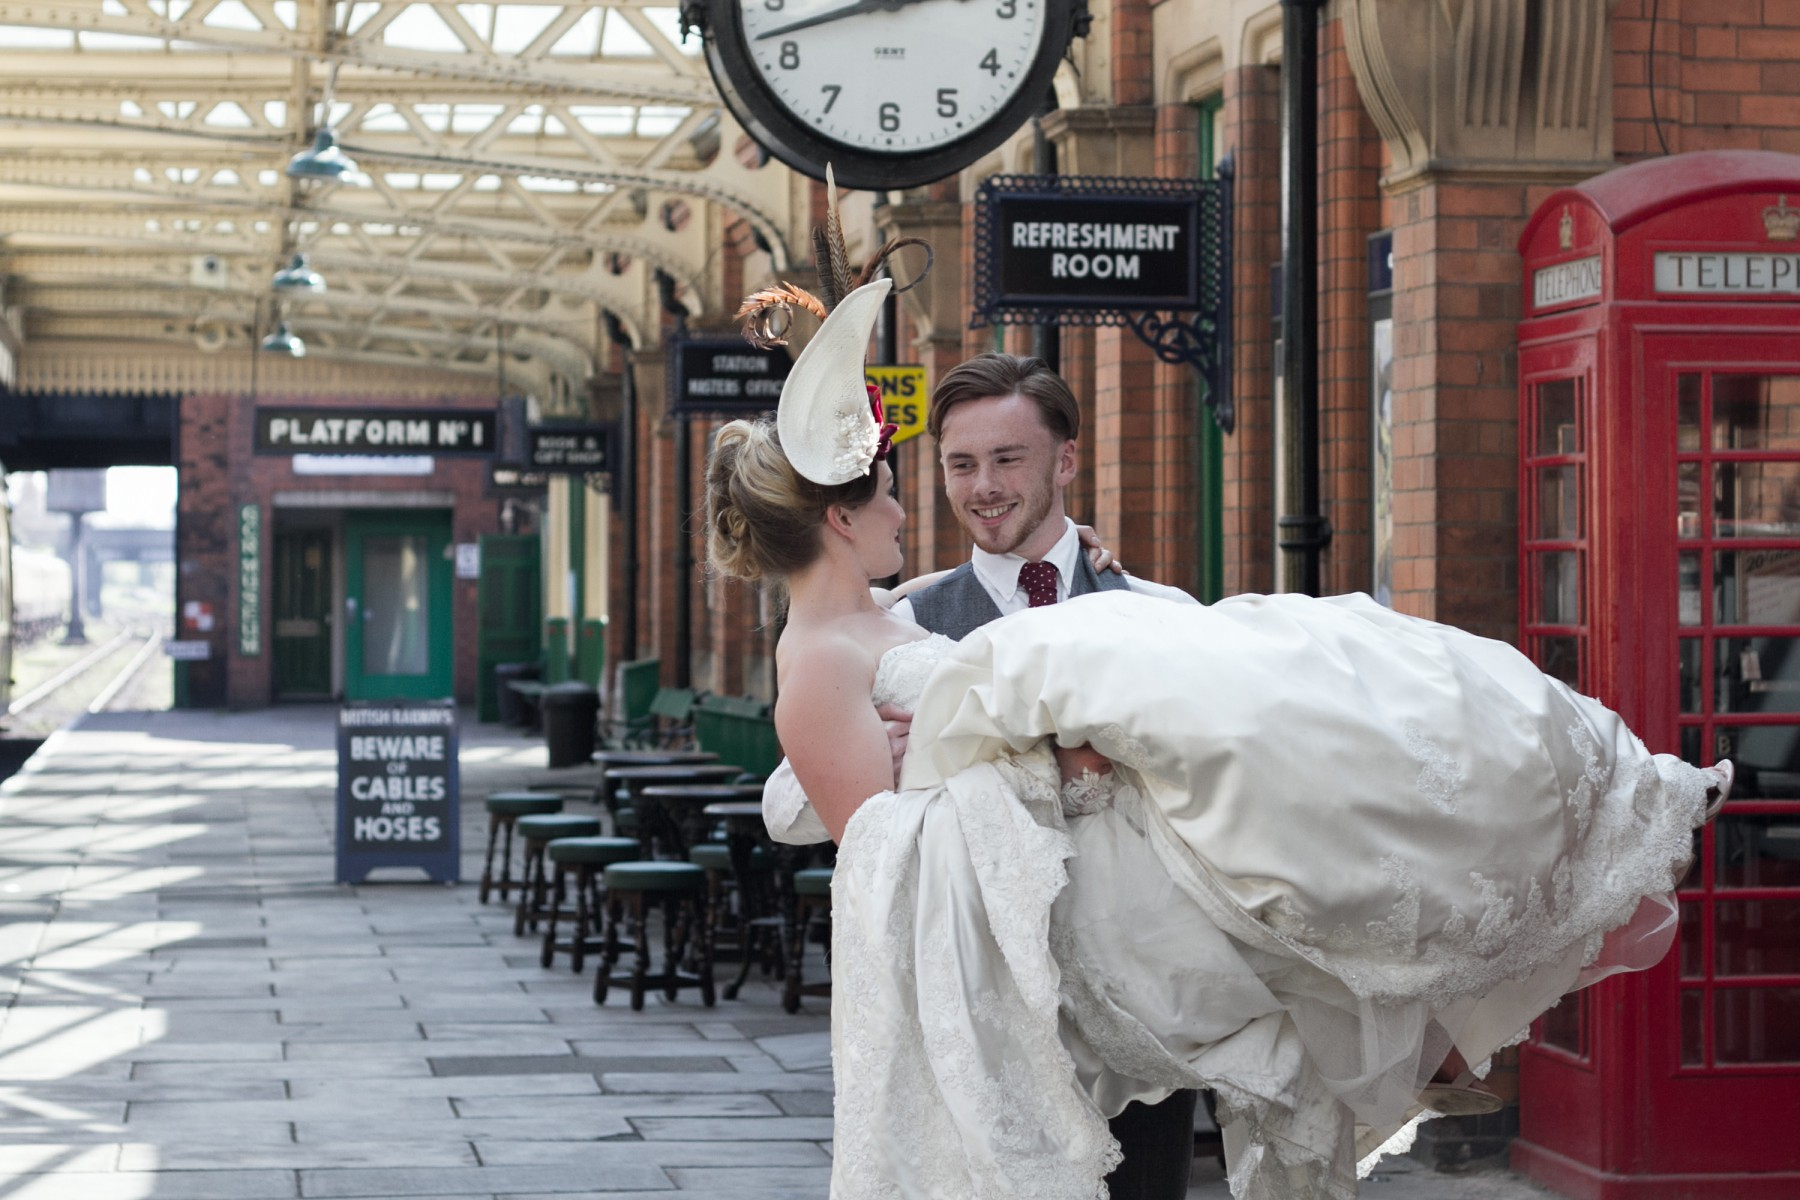 Iso Elegant Photography - Leicester wedding network - Railway wedding - vintage wedding 27